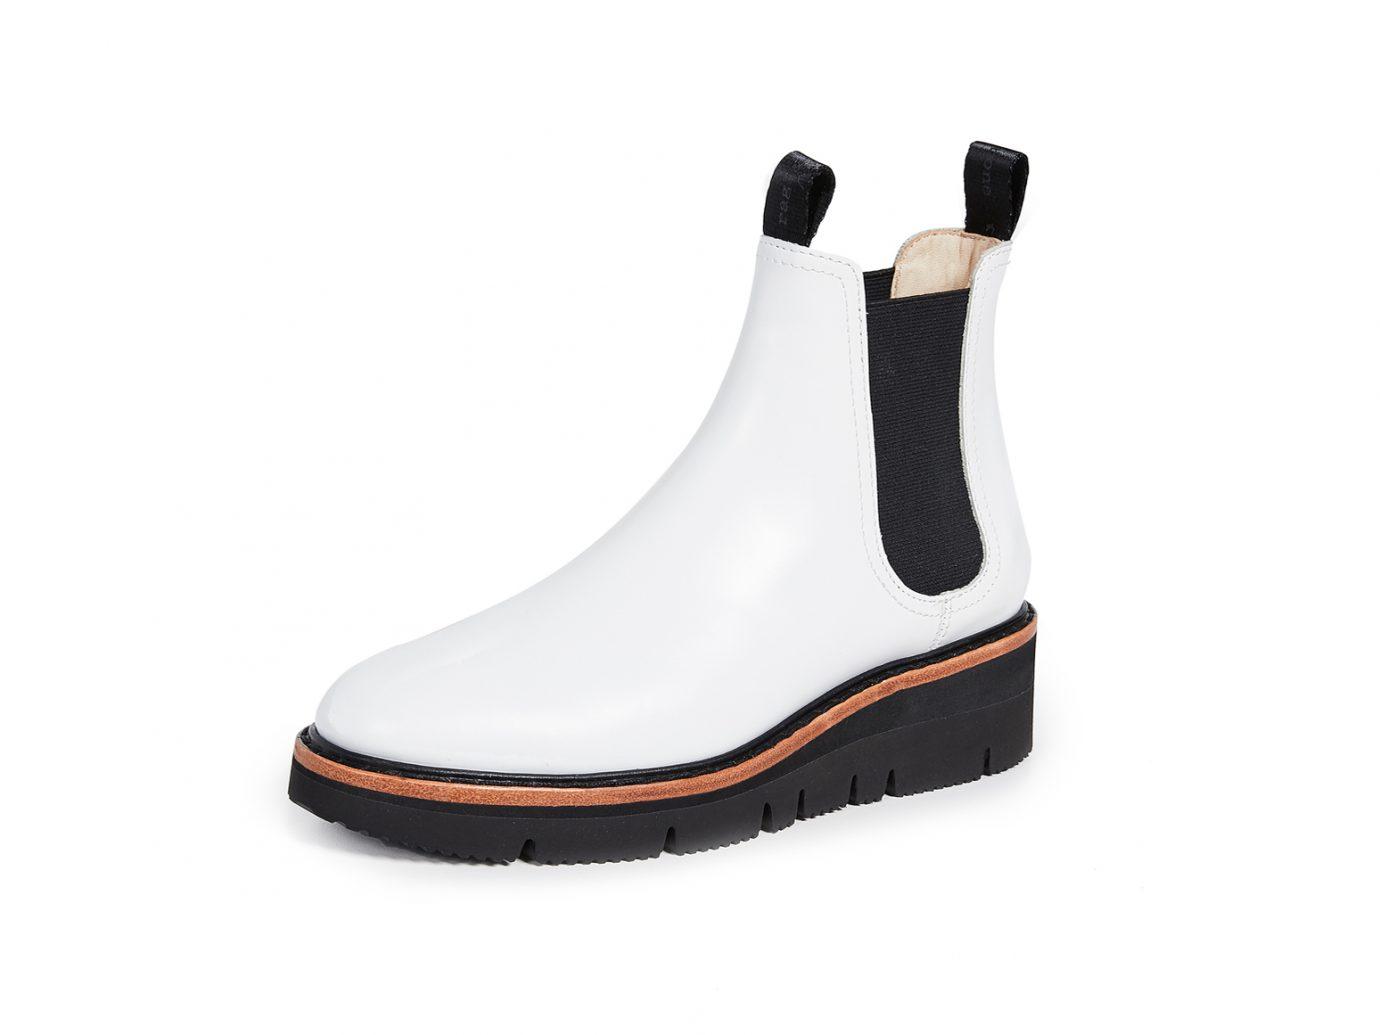 Rag & Bone Taryn Chelsea Boots